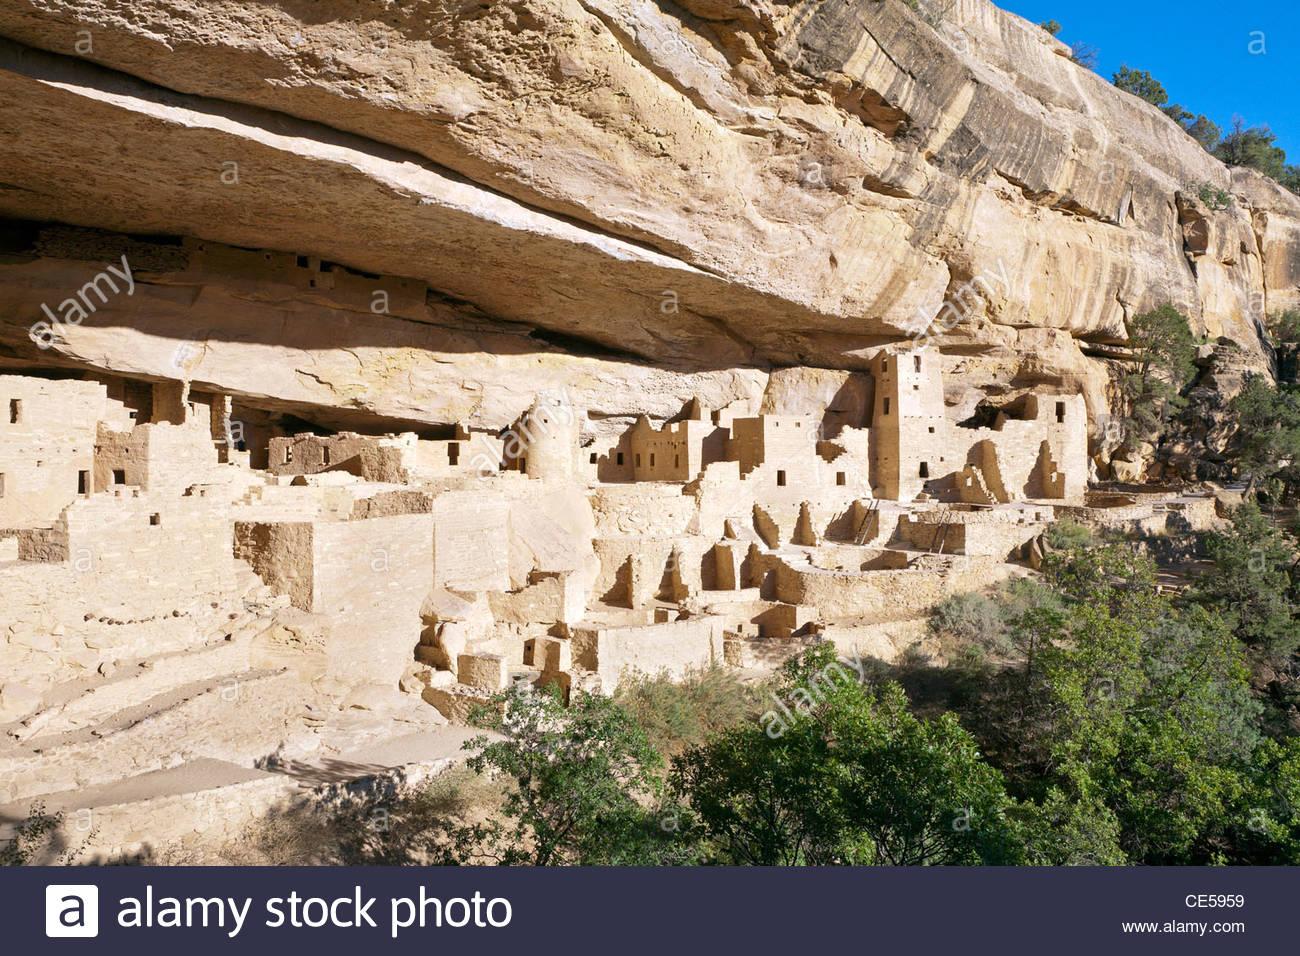 Cliff Palace Anasazi ruins, Mesa Verde National Park, Colorado, United States - Stock Image